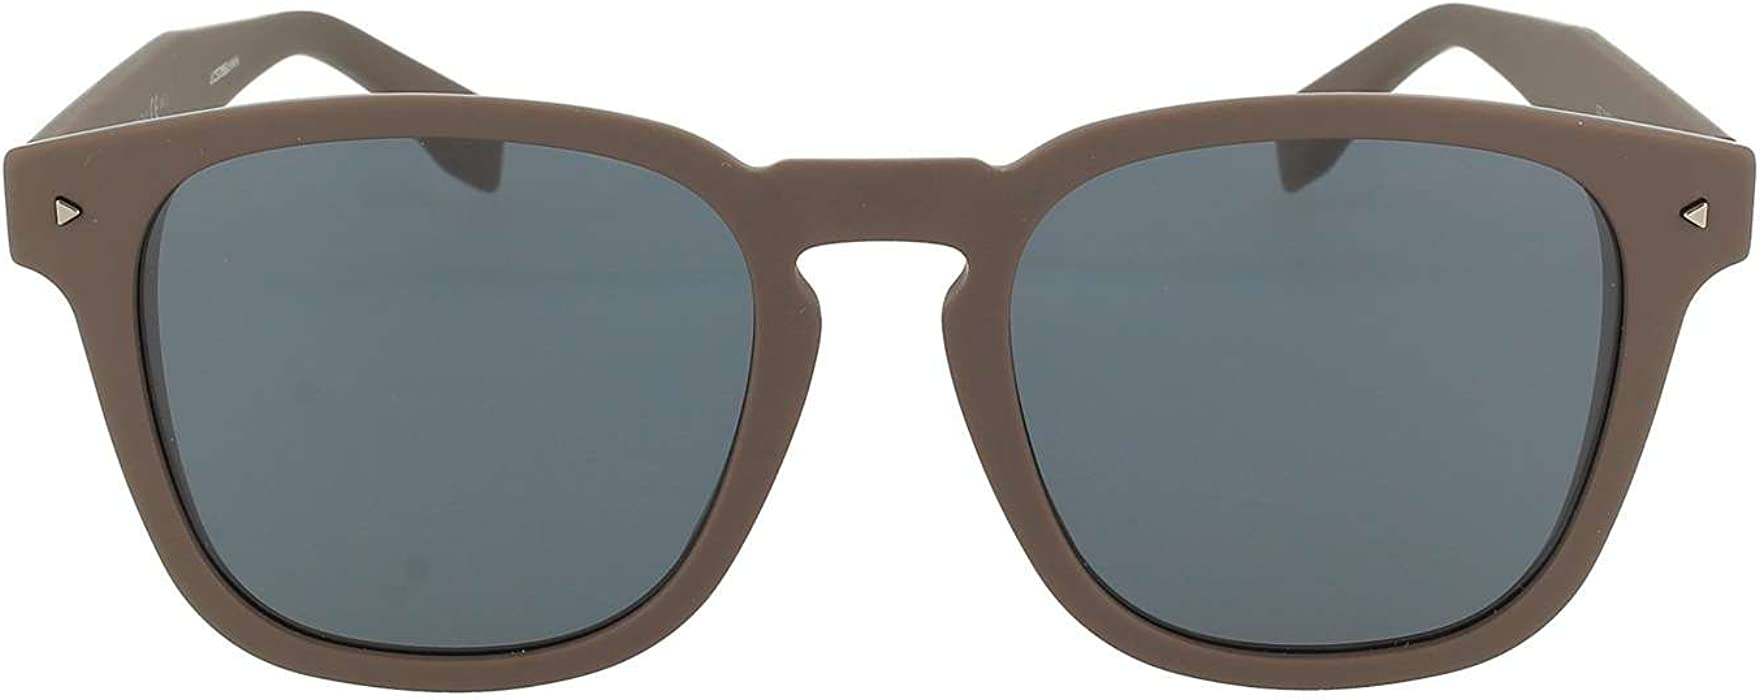 646f784dc5cd Fendi Ff M0018 s Sunglasses Men  Amazon.co.uk  Clothing